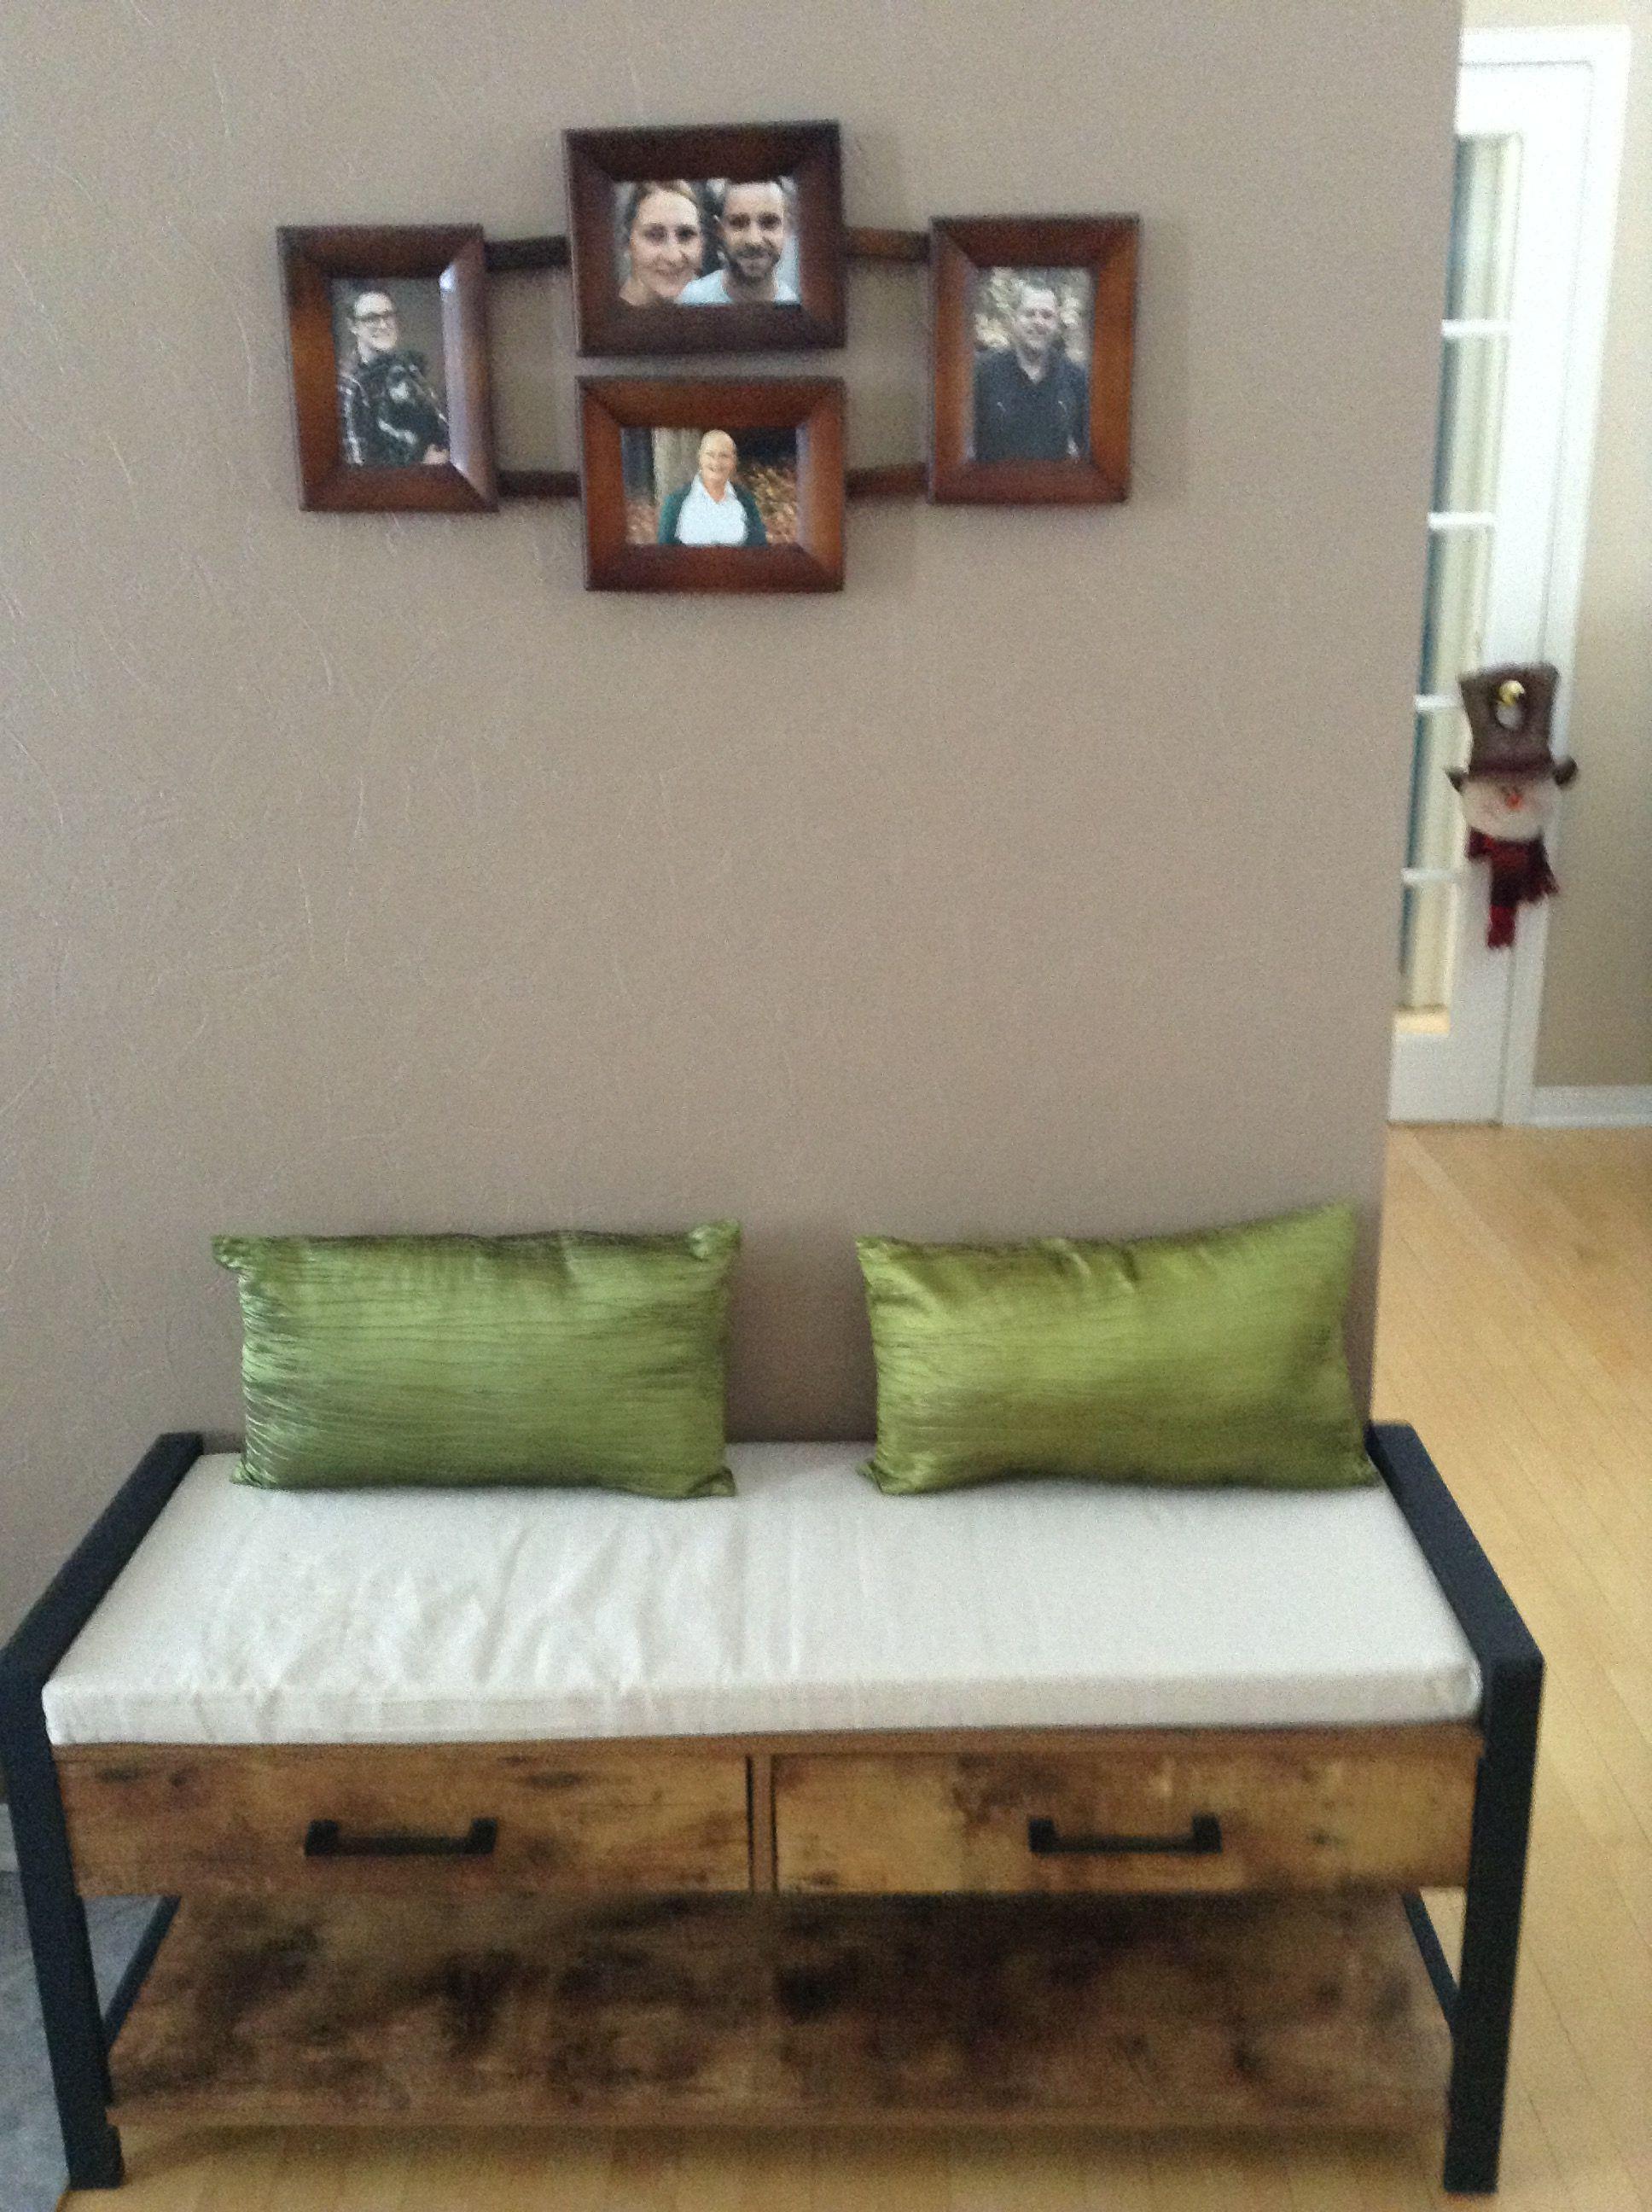 Walmart Special Pas Pire Hein Home Decor Decor Furniture